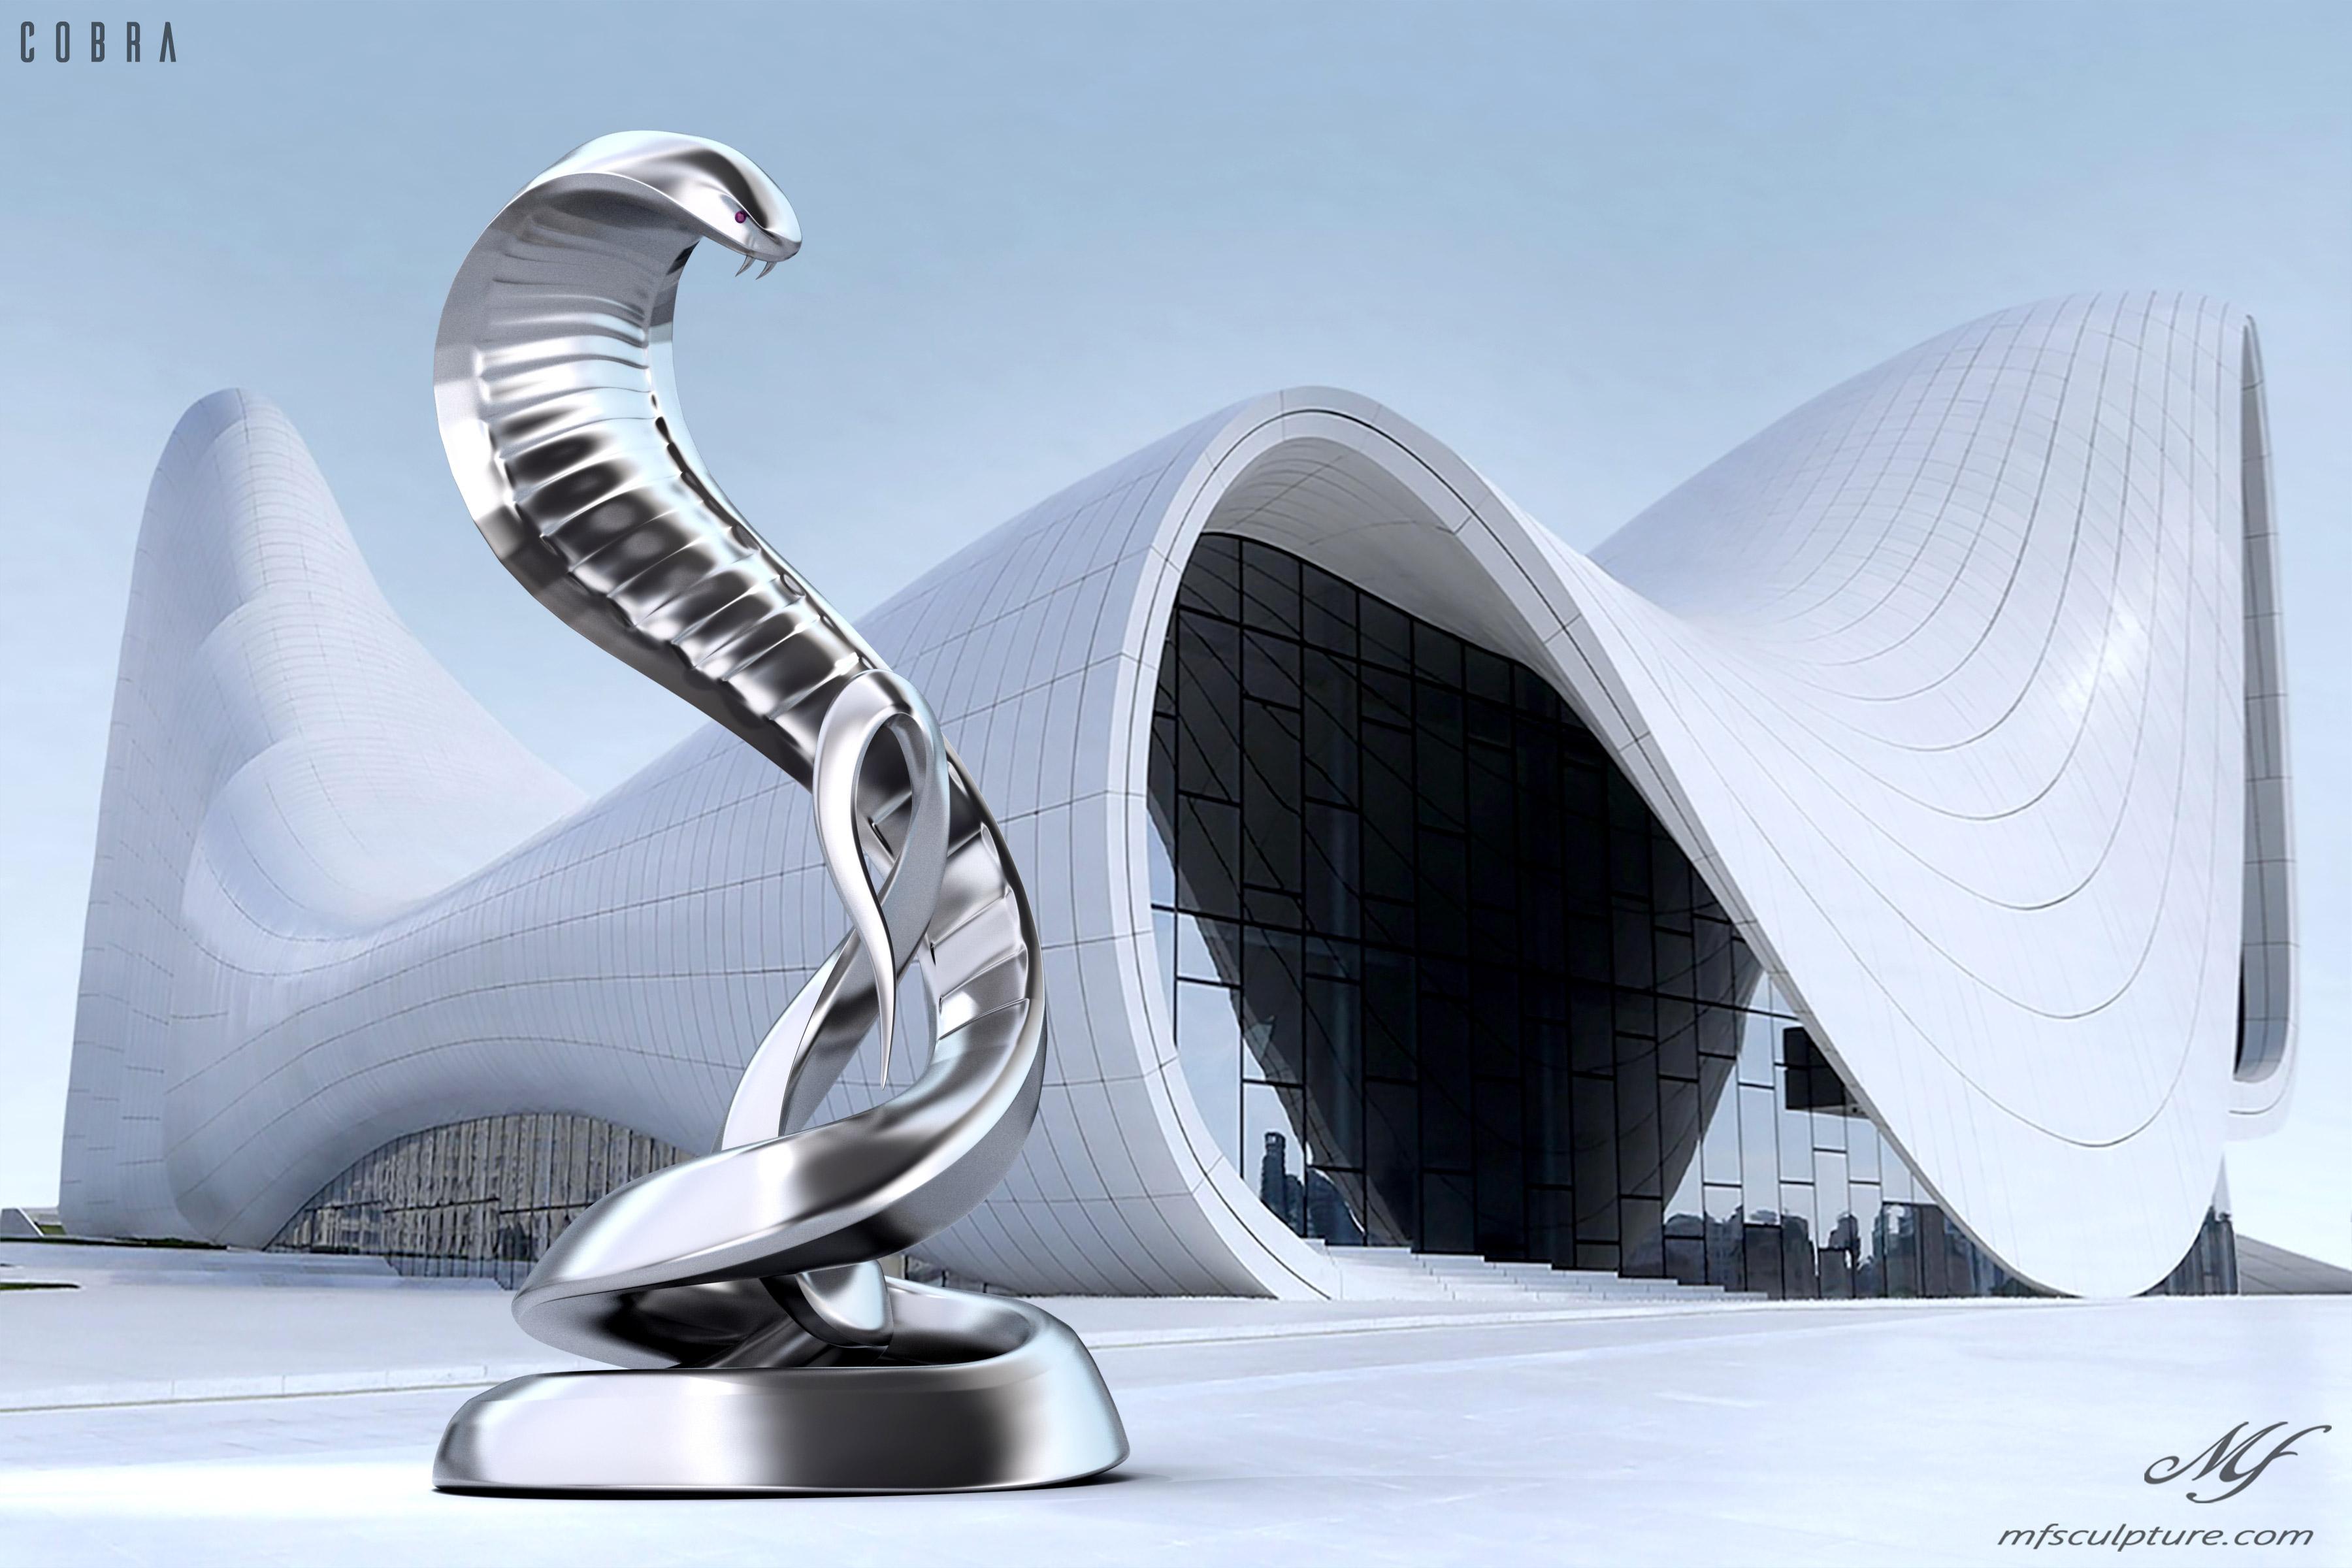 Heydar Aliyev Zaha Hadid Modern Sculpture Cobra2 2